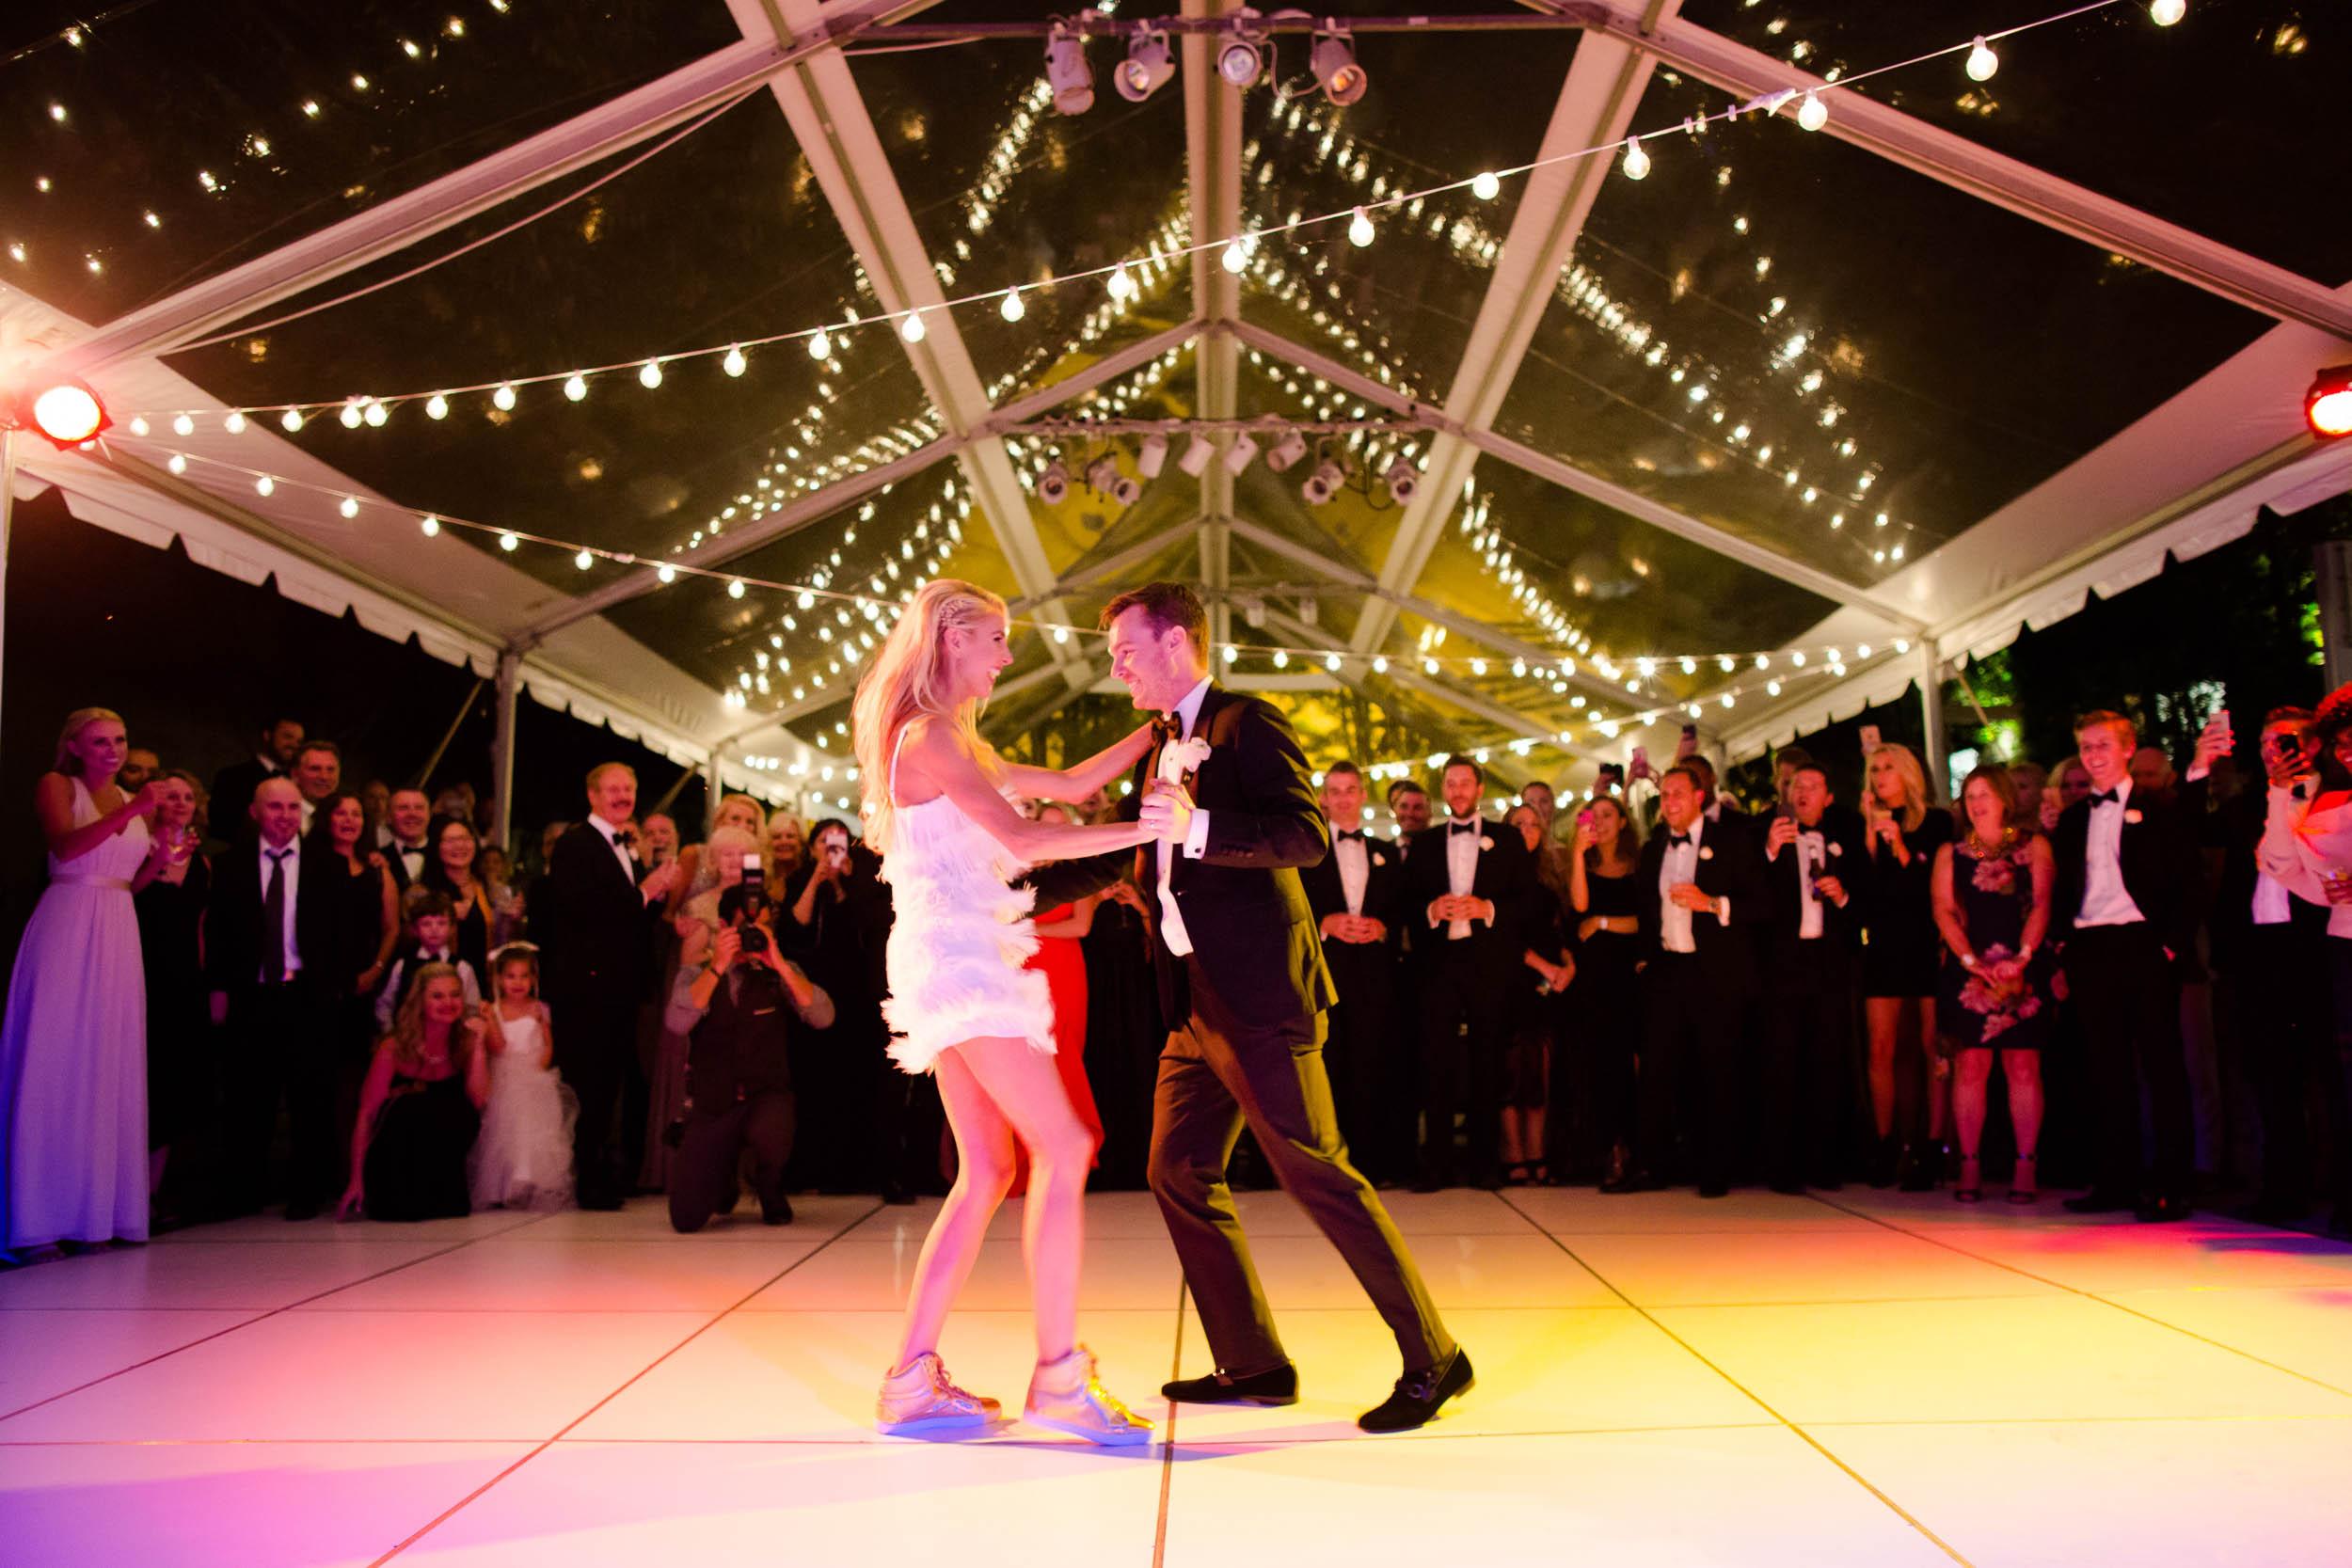 chicago-illuminating-co-wedding-photos-75.jpg